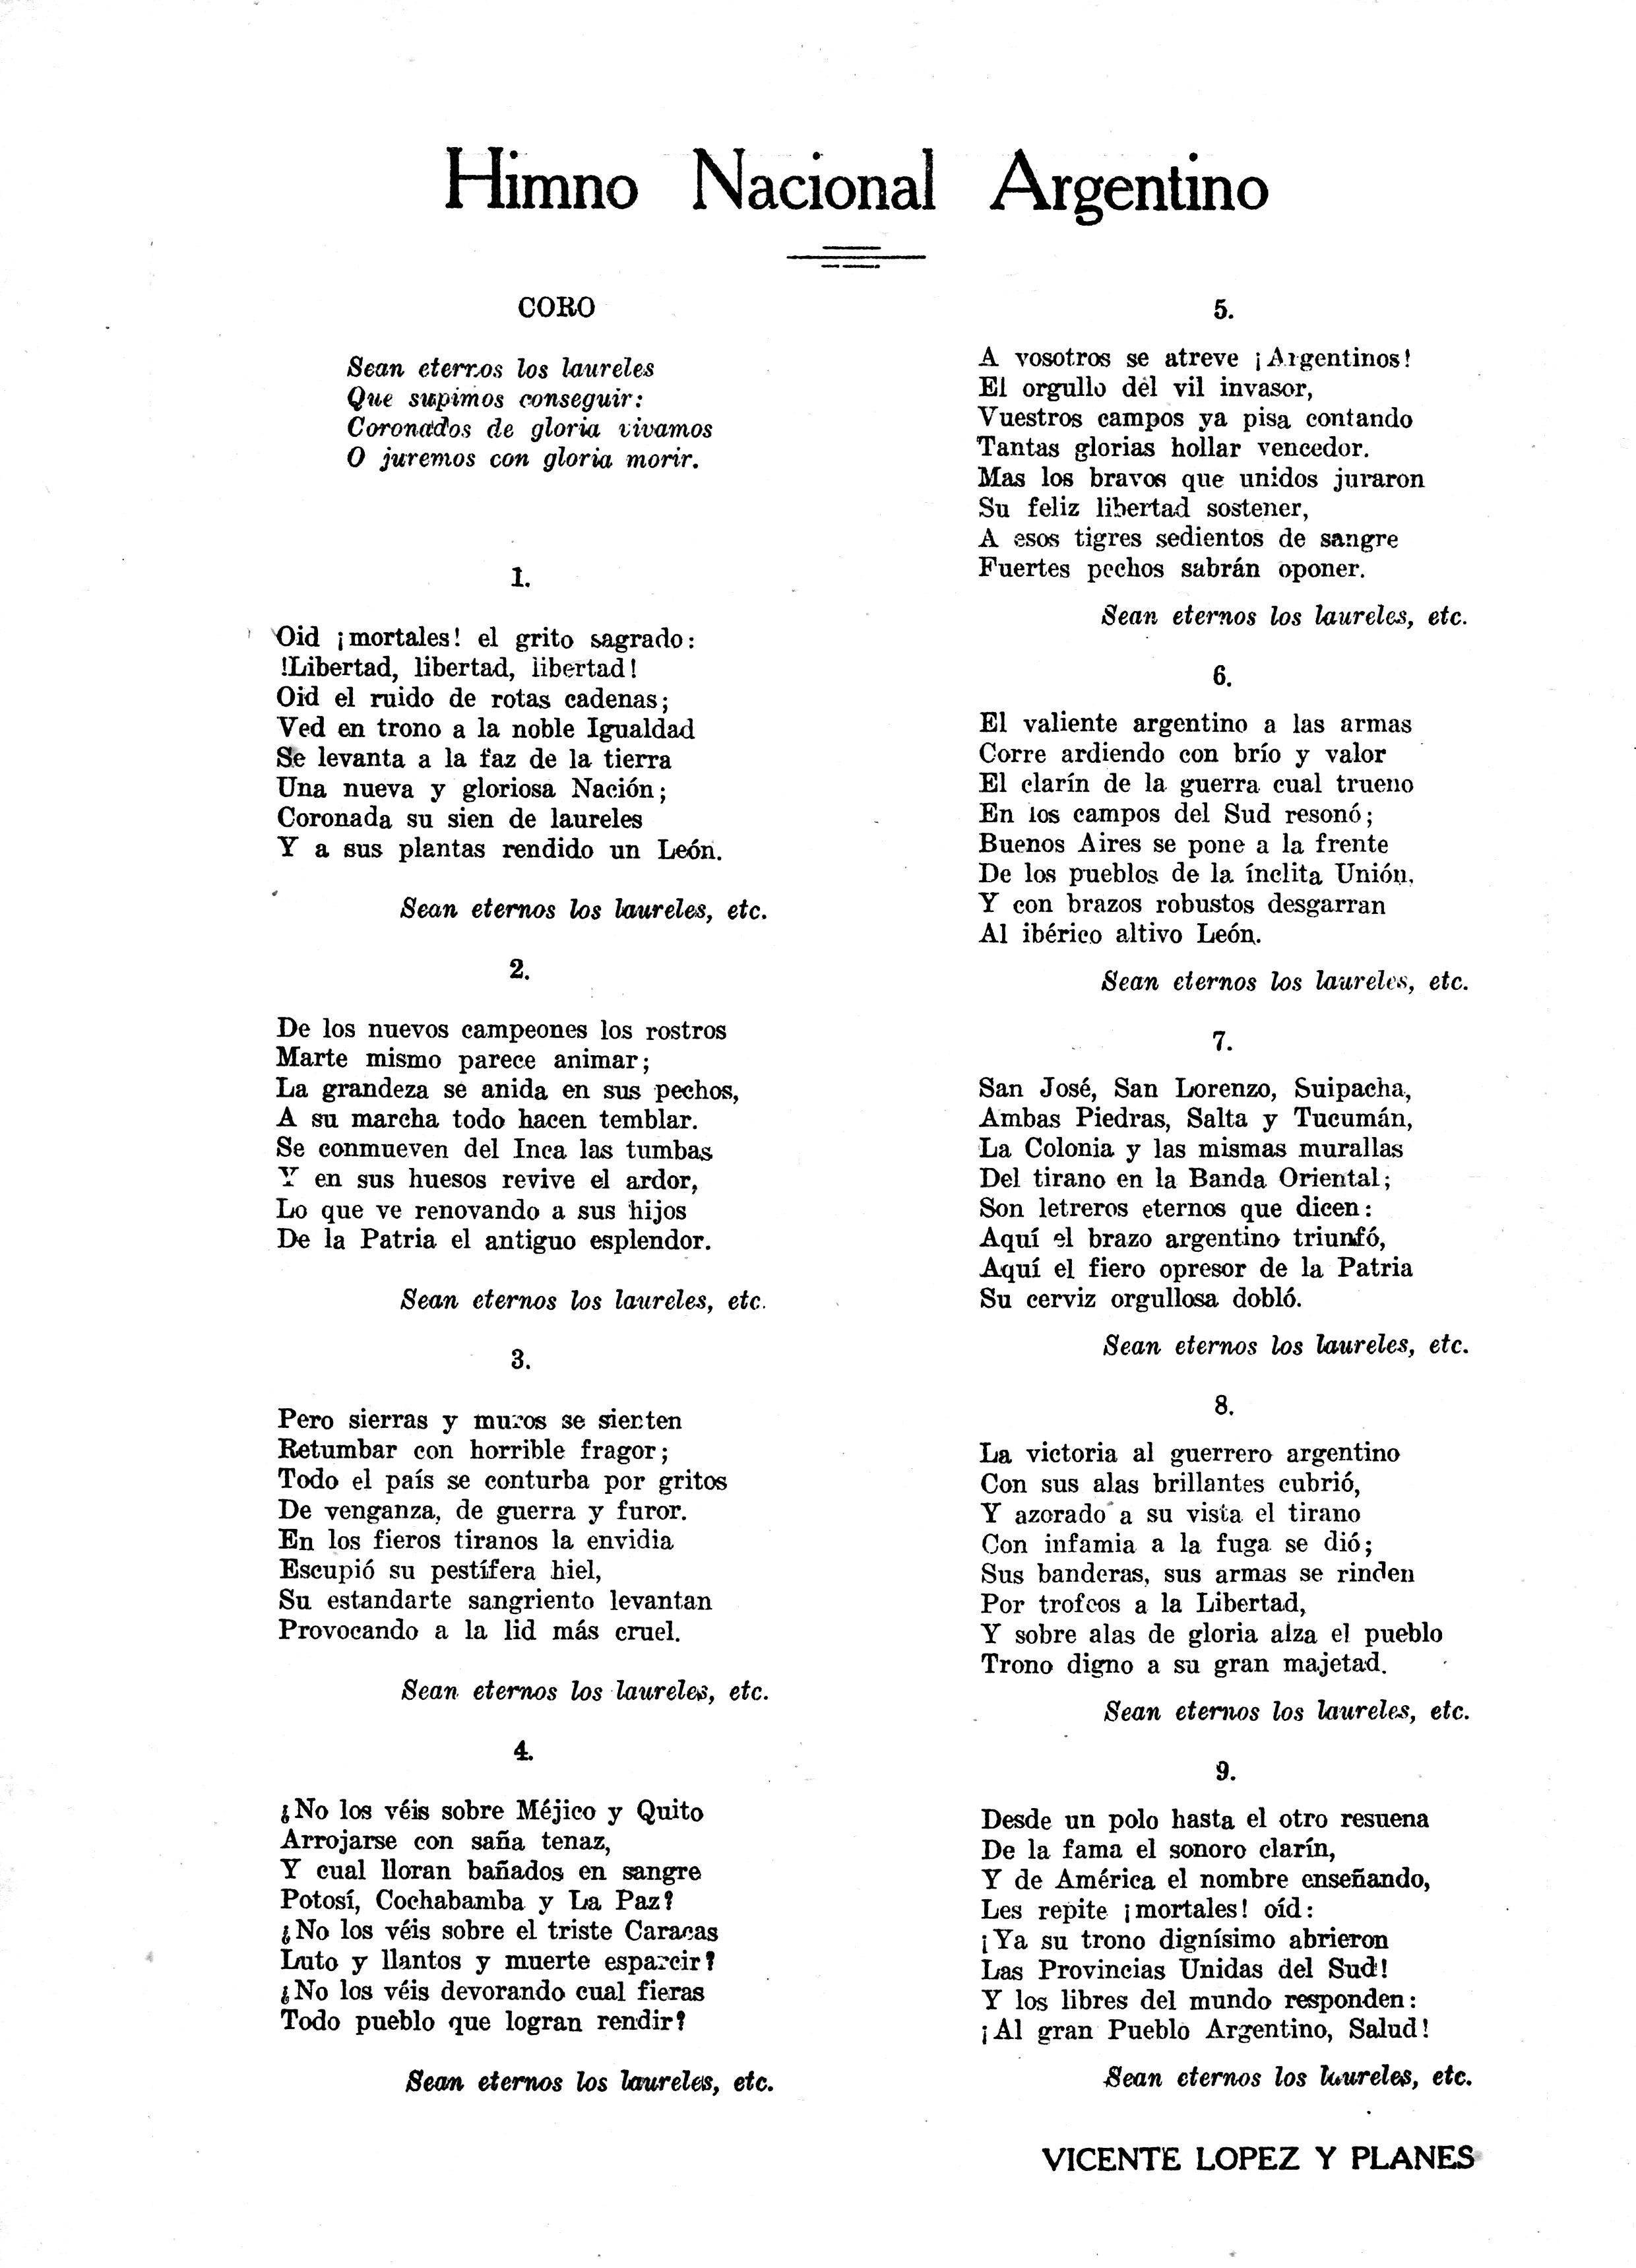 Himno Argentino Himno Nacional Argentino Himno Argentino Letra Himno Nacional